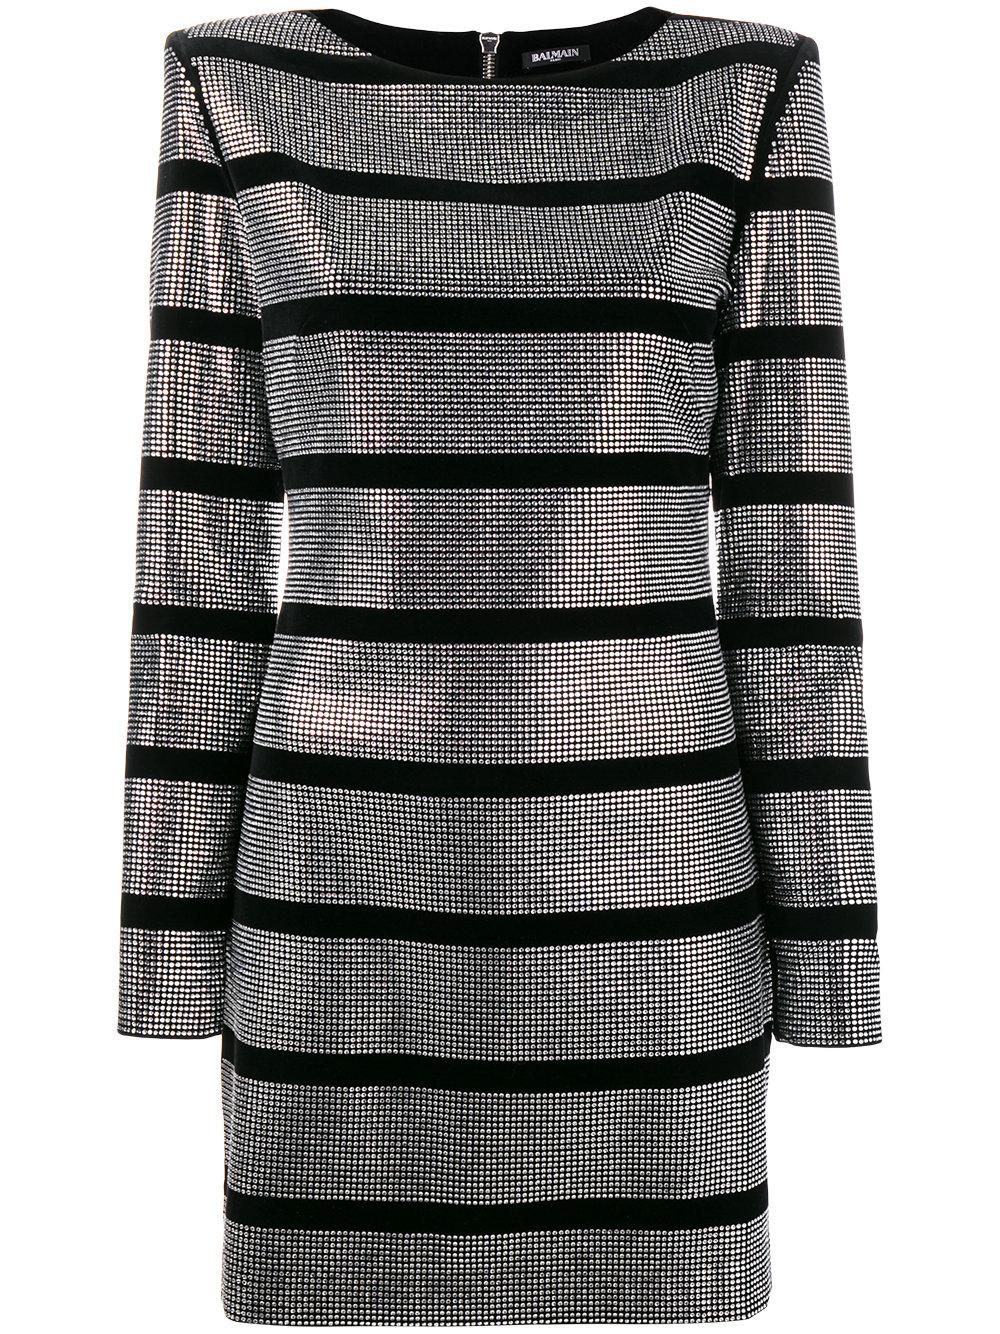 BALMAIN dress - $2,985